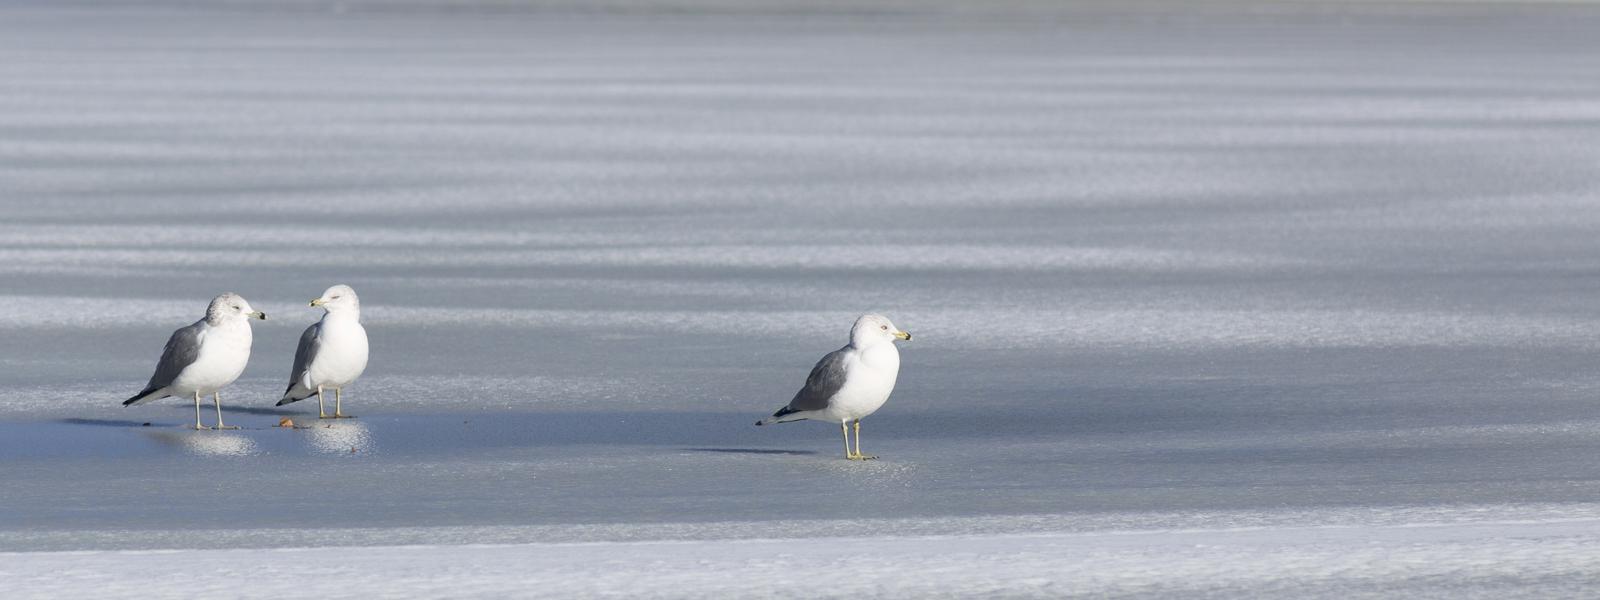 Winter an der Nordsee